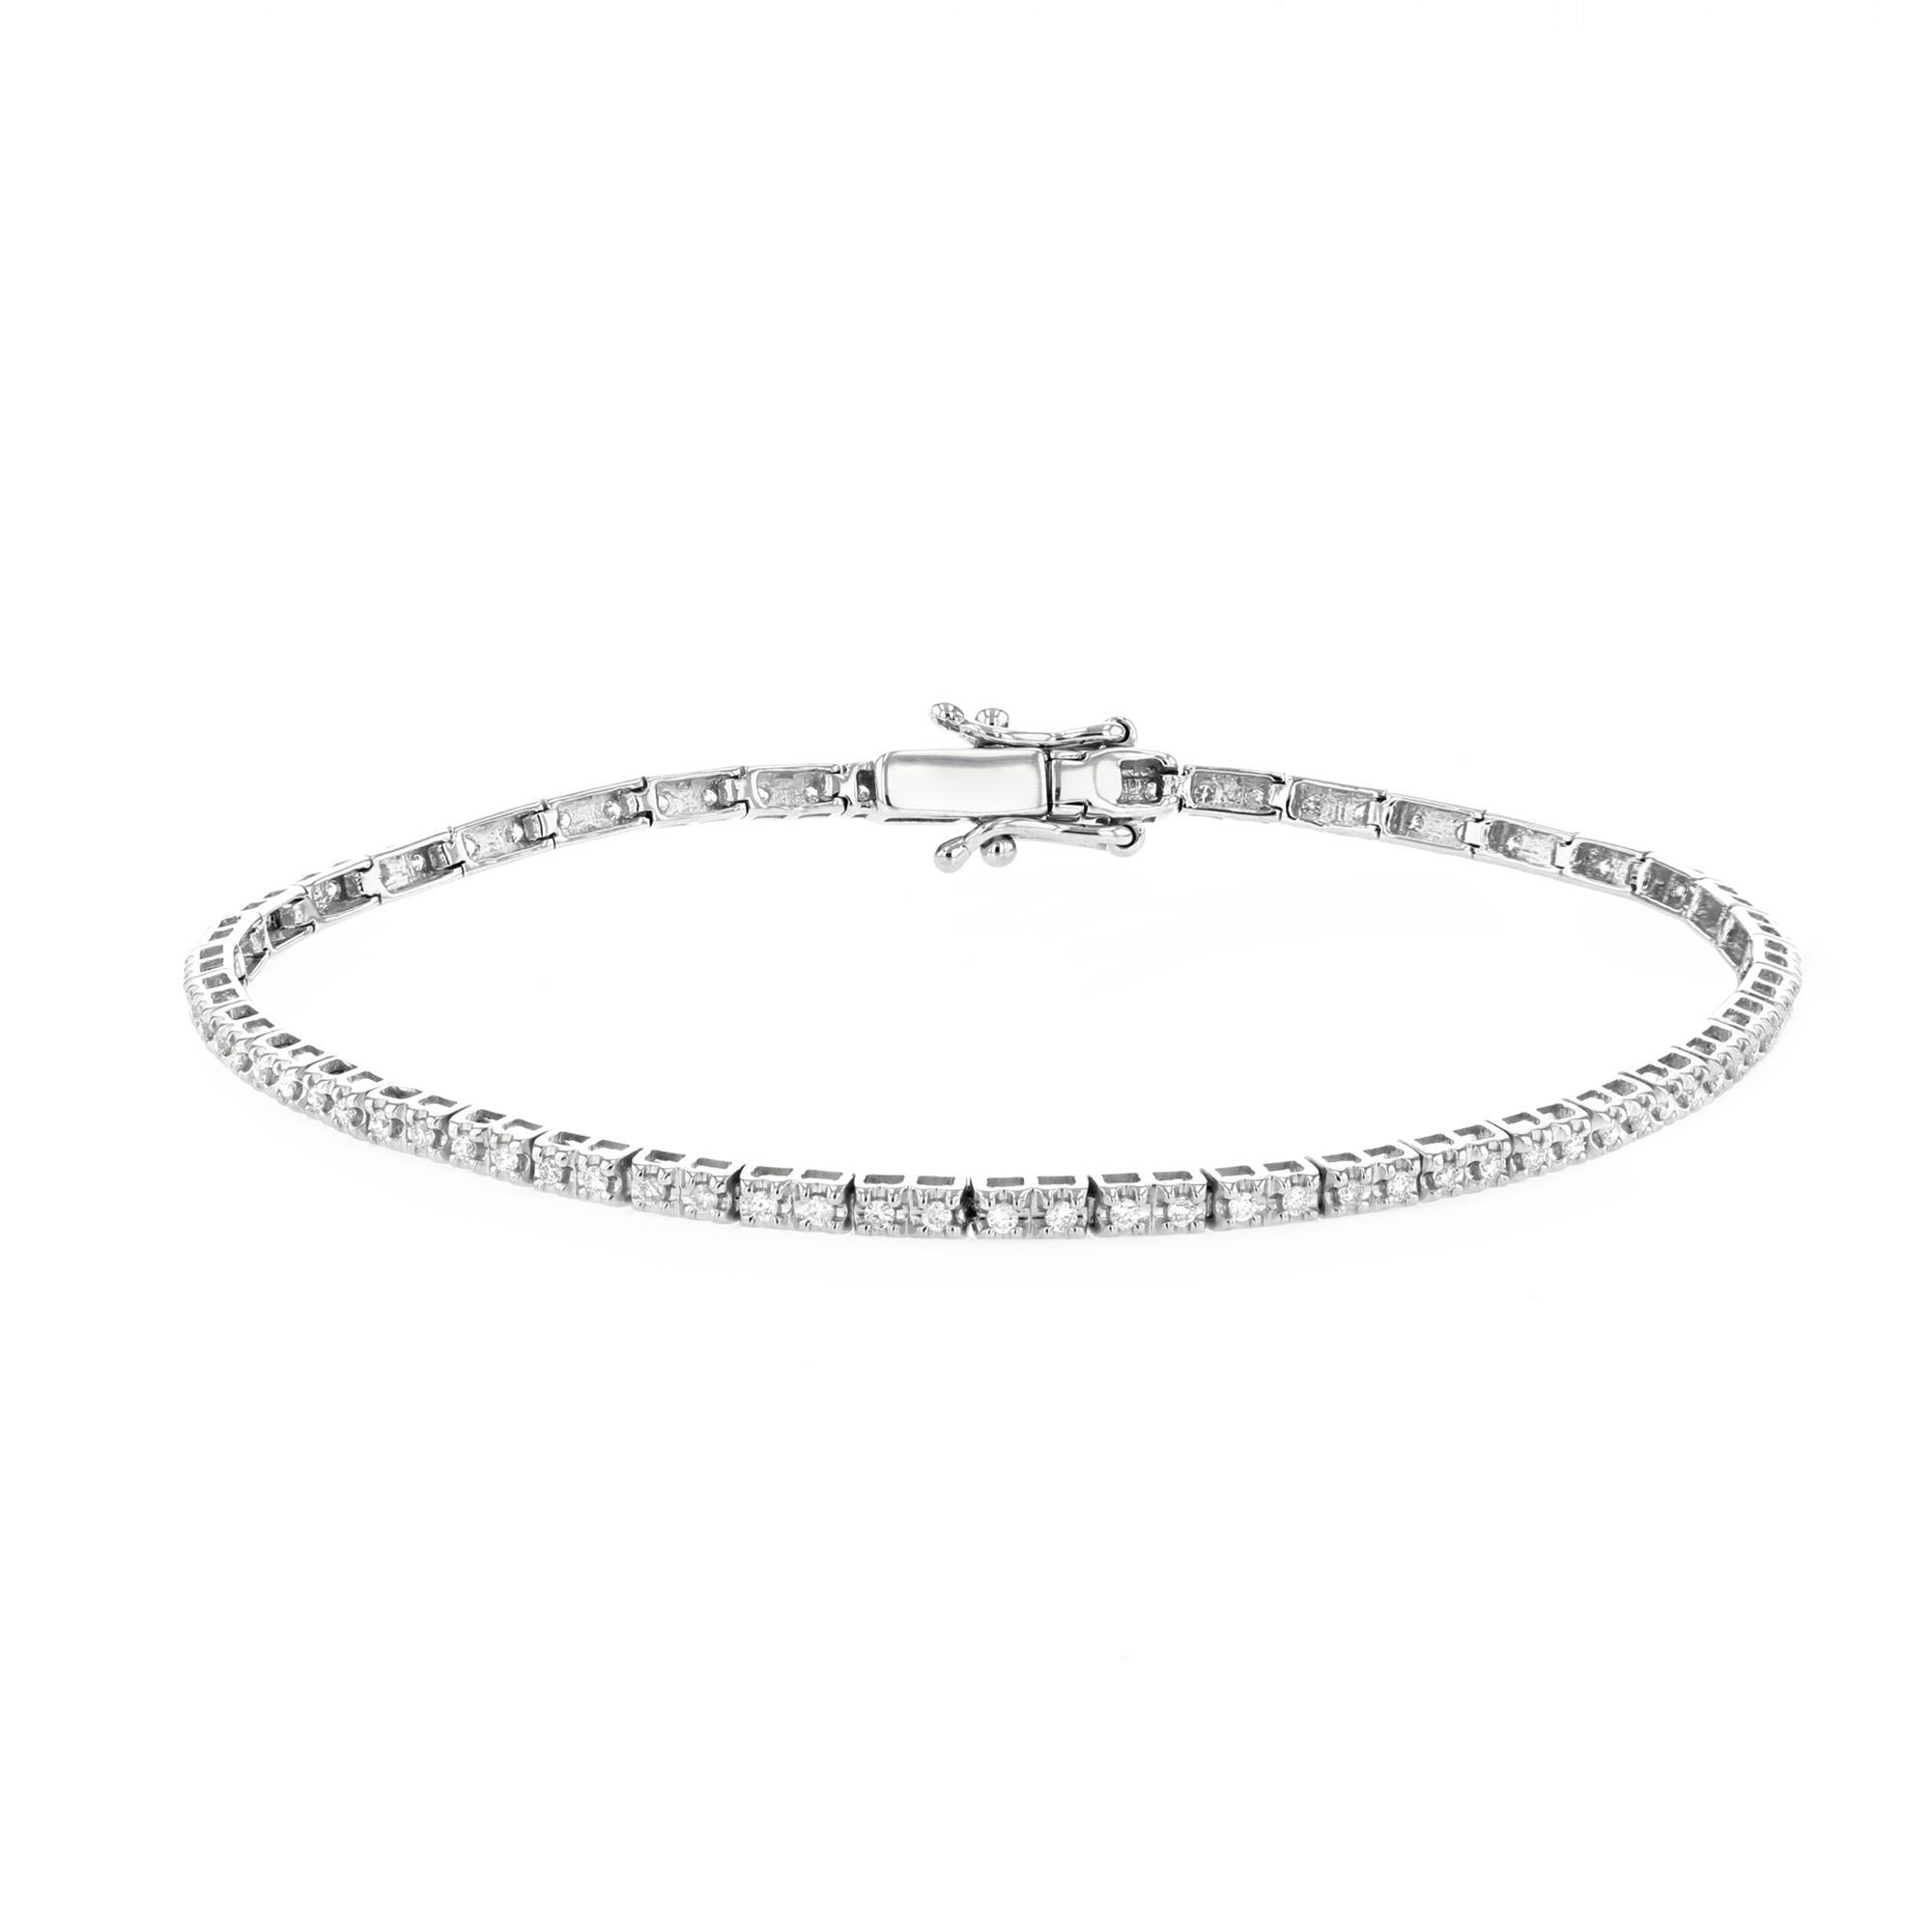 Radiance Collection 0.50ct Petite Diamond Tennis Bracelet | 9K White Gold